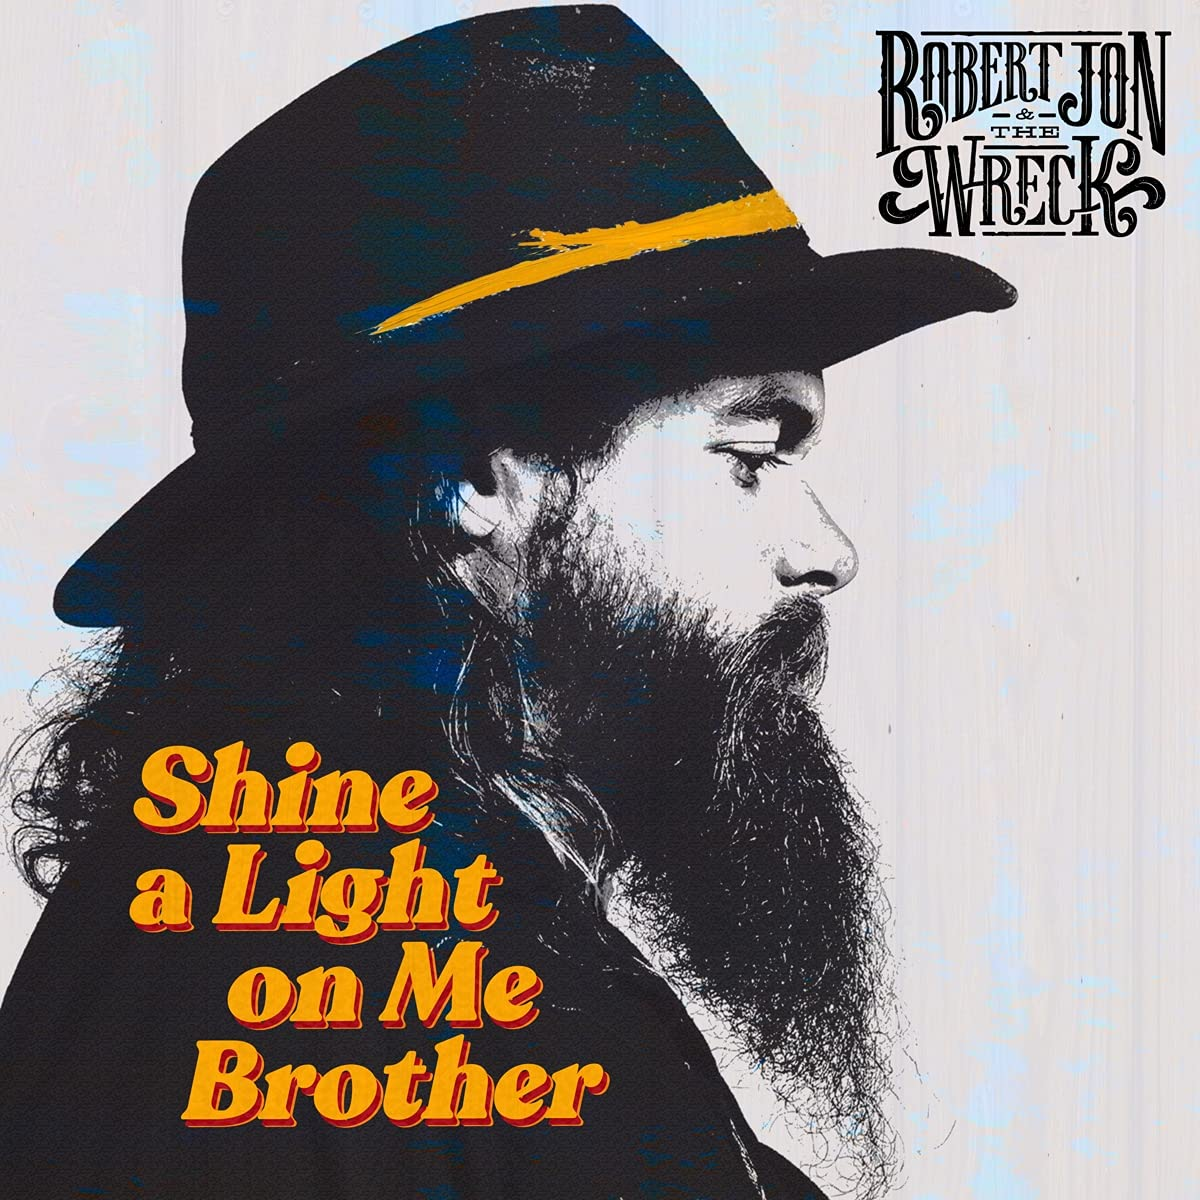 ROBERT JON AND THE WRECK - Shine A Light On Me Brother